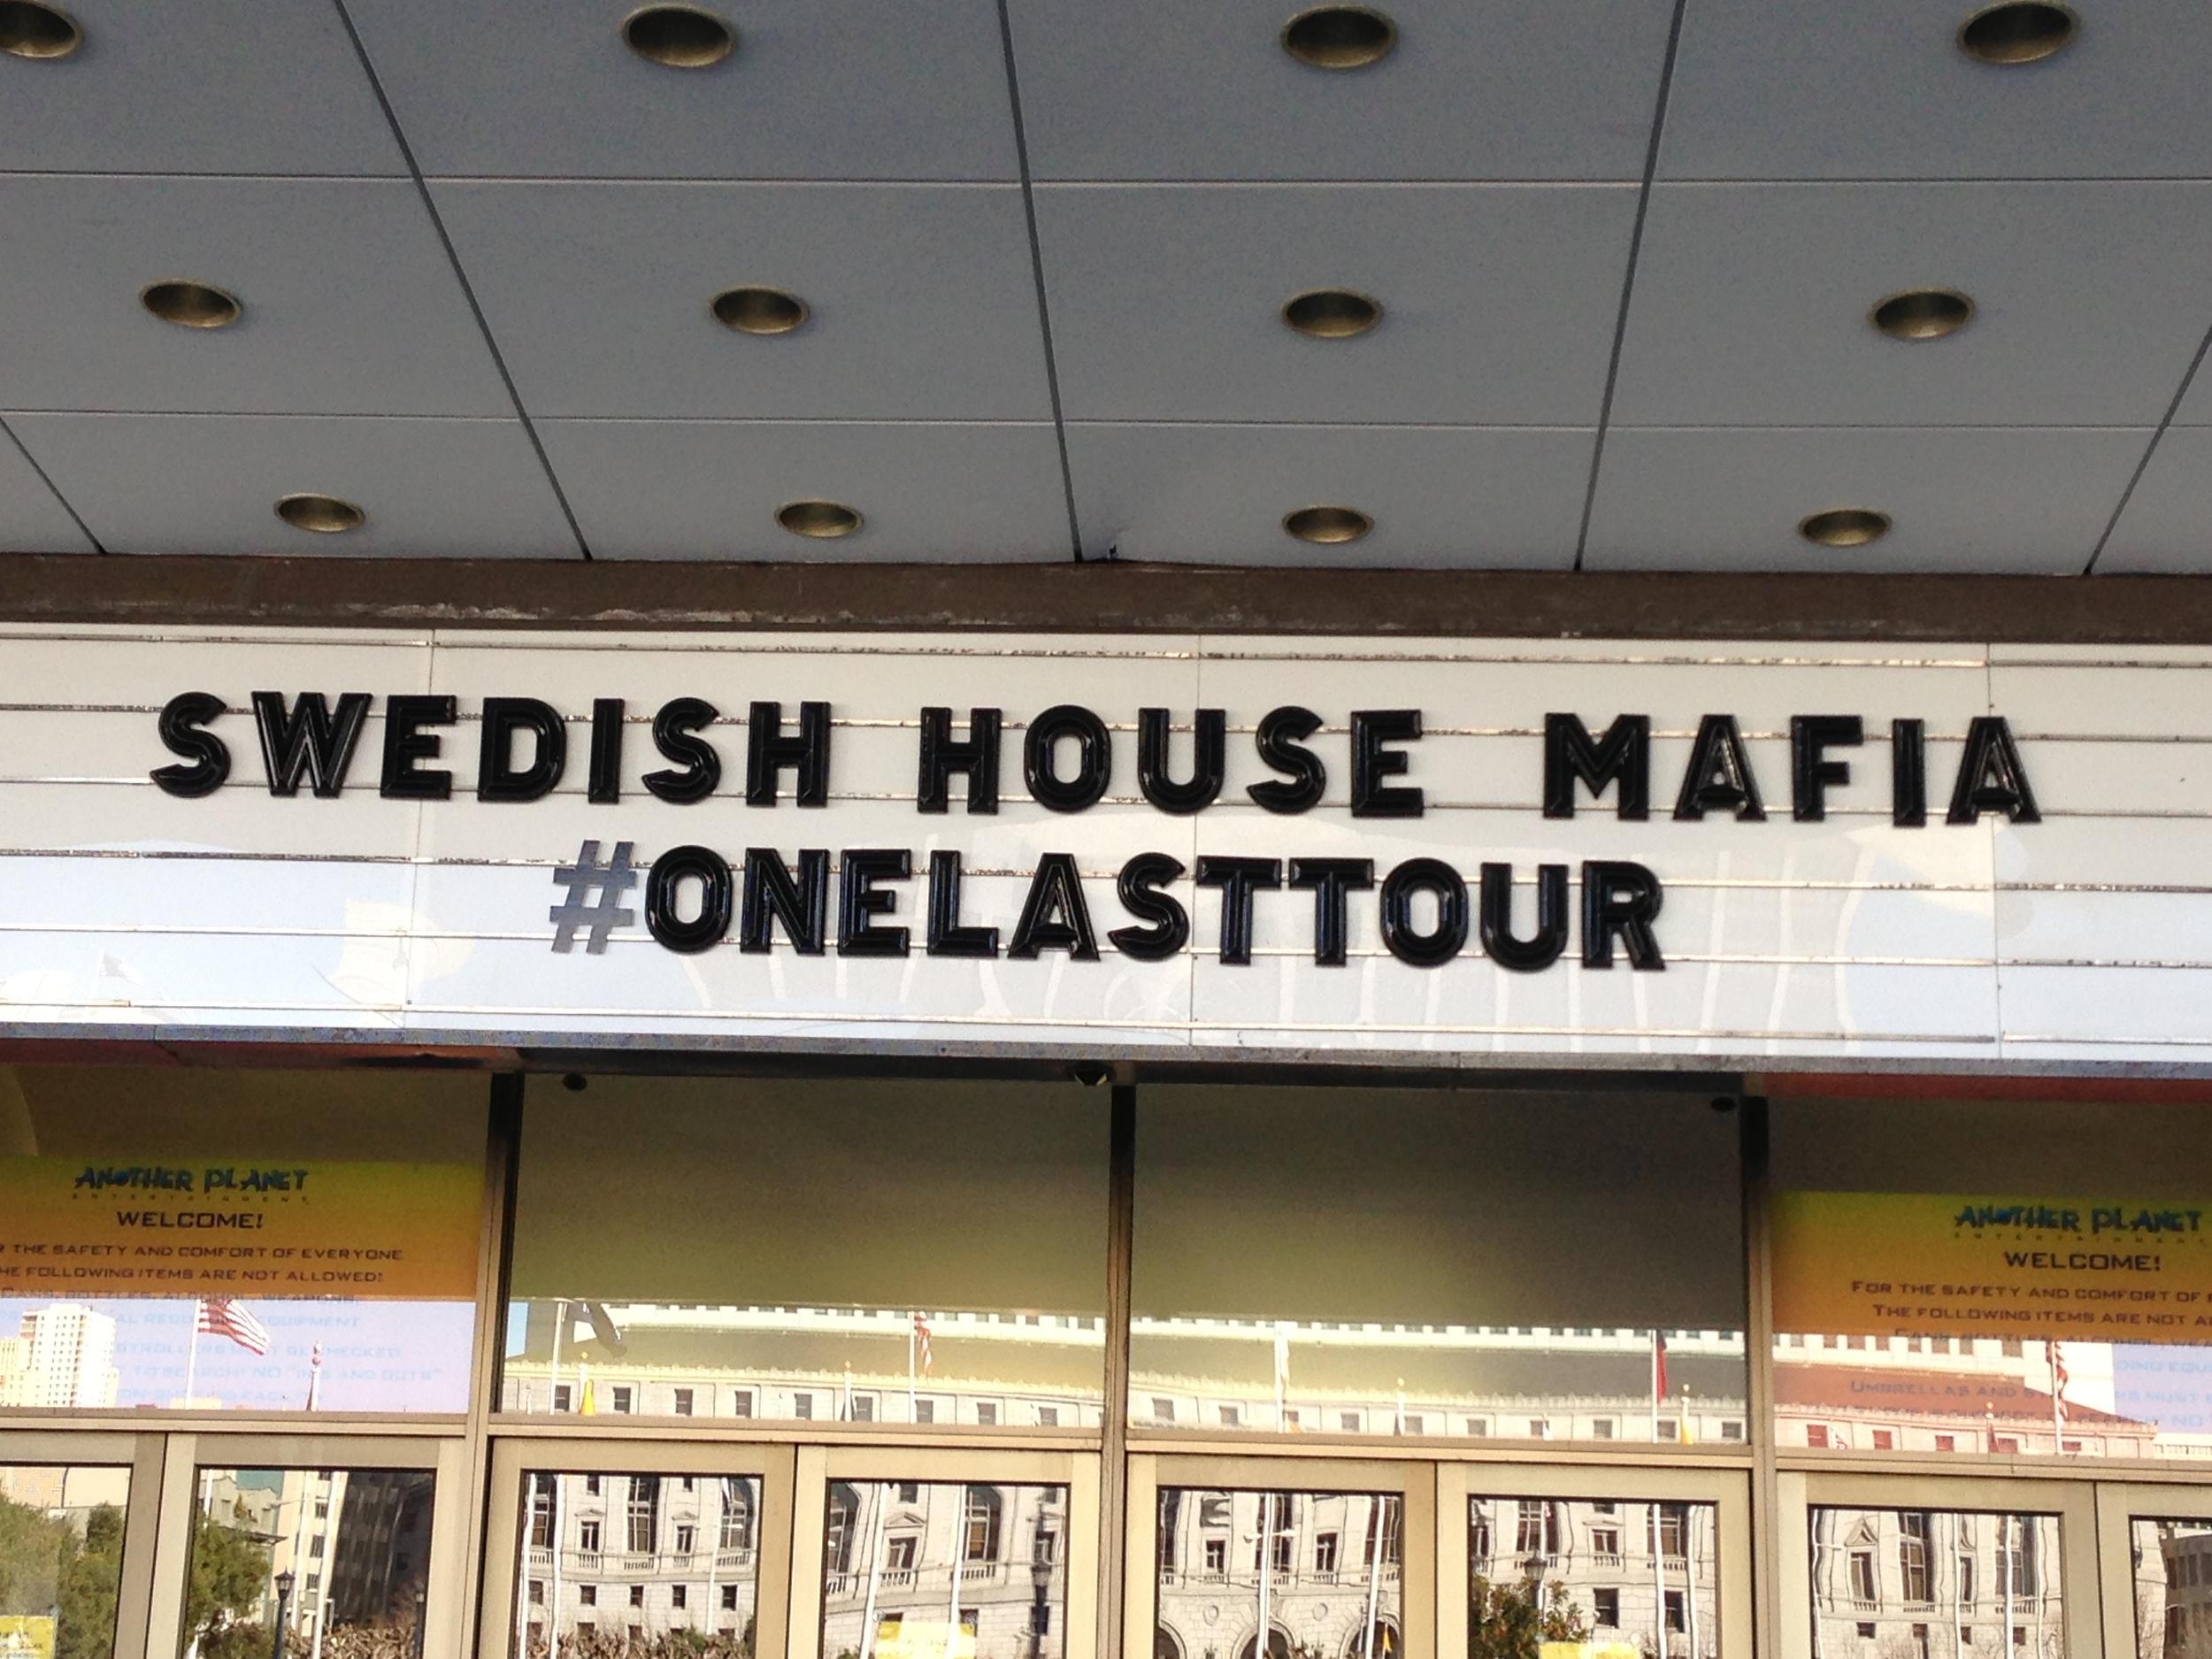 One Last Tour (Photo Credit: Ramon Corro)